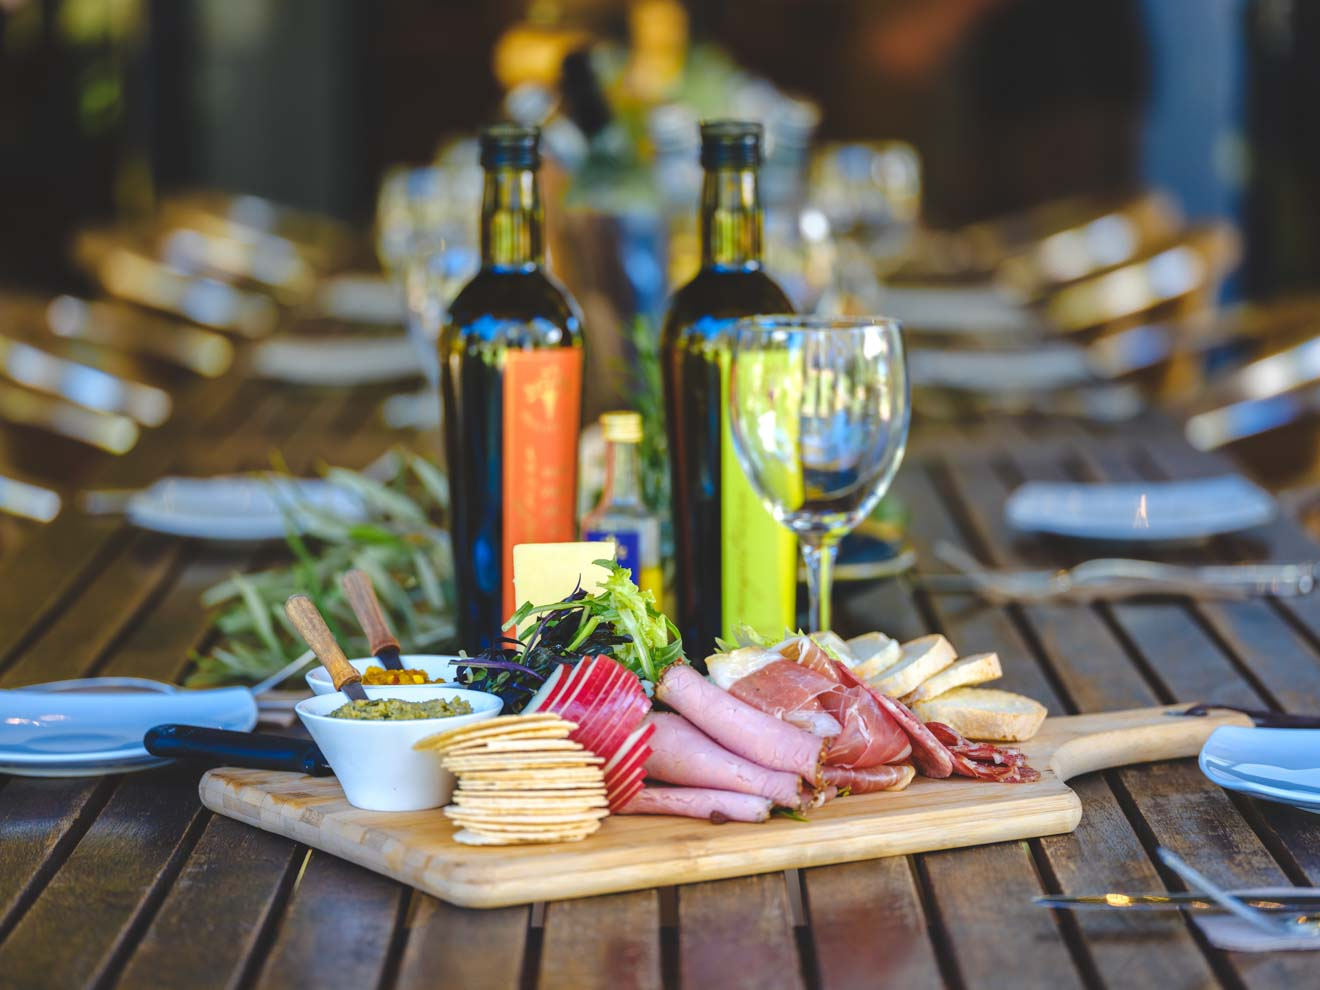 dish Margaret River wineries open for dinner